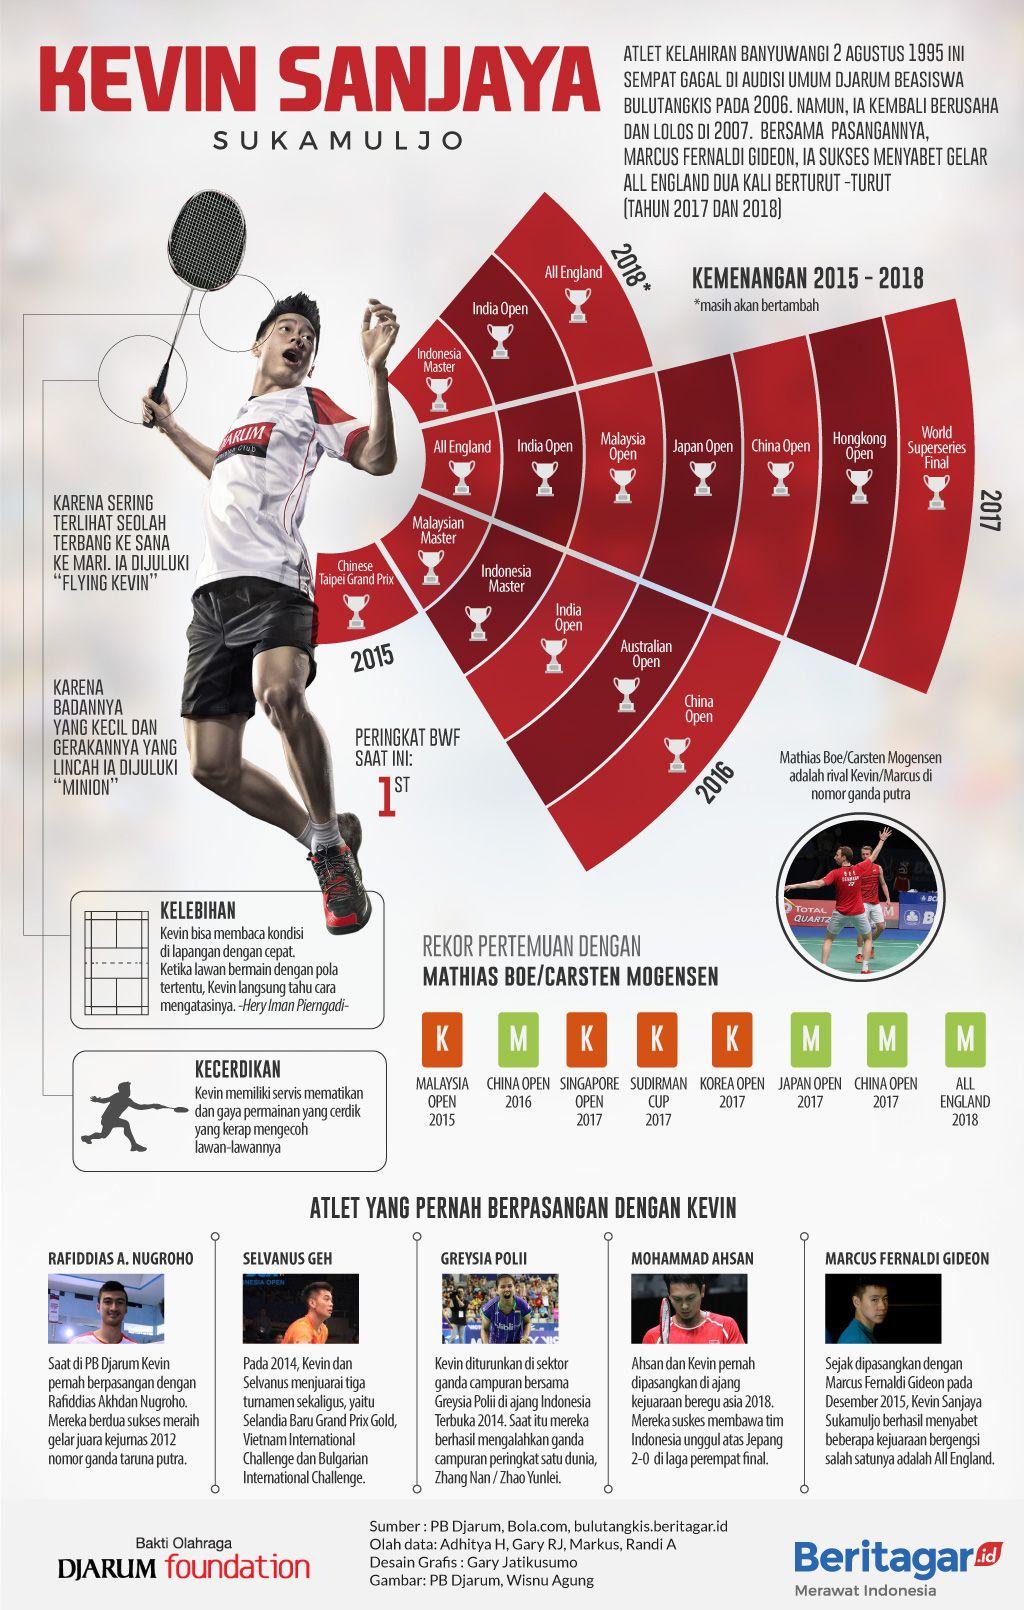 Kevin Sanjaya Infographic Atlet Persamaan Gagal